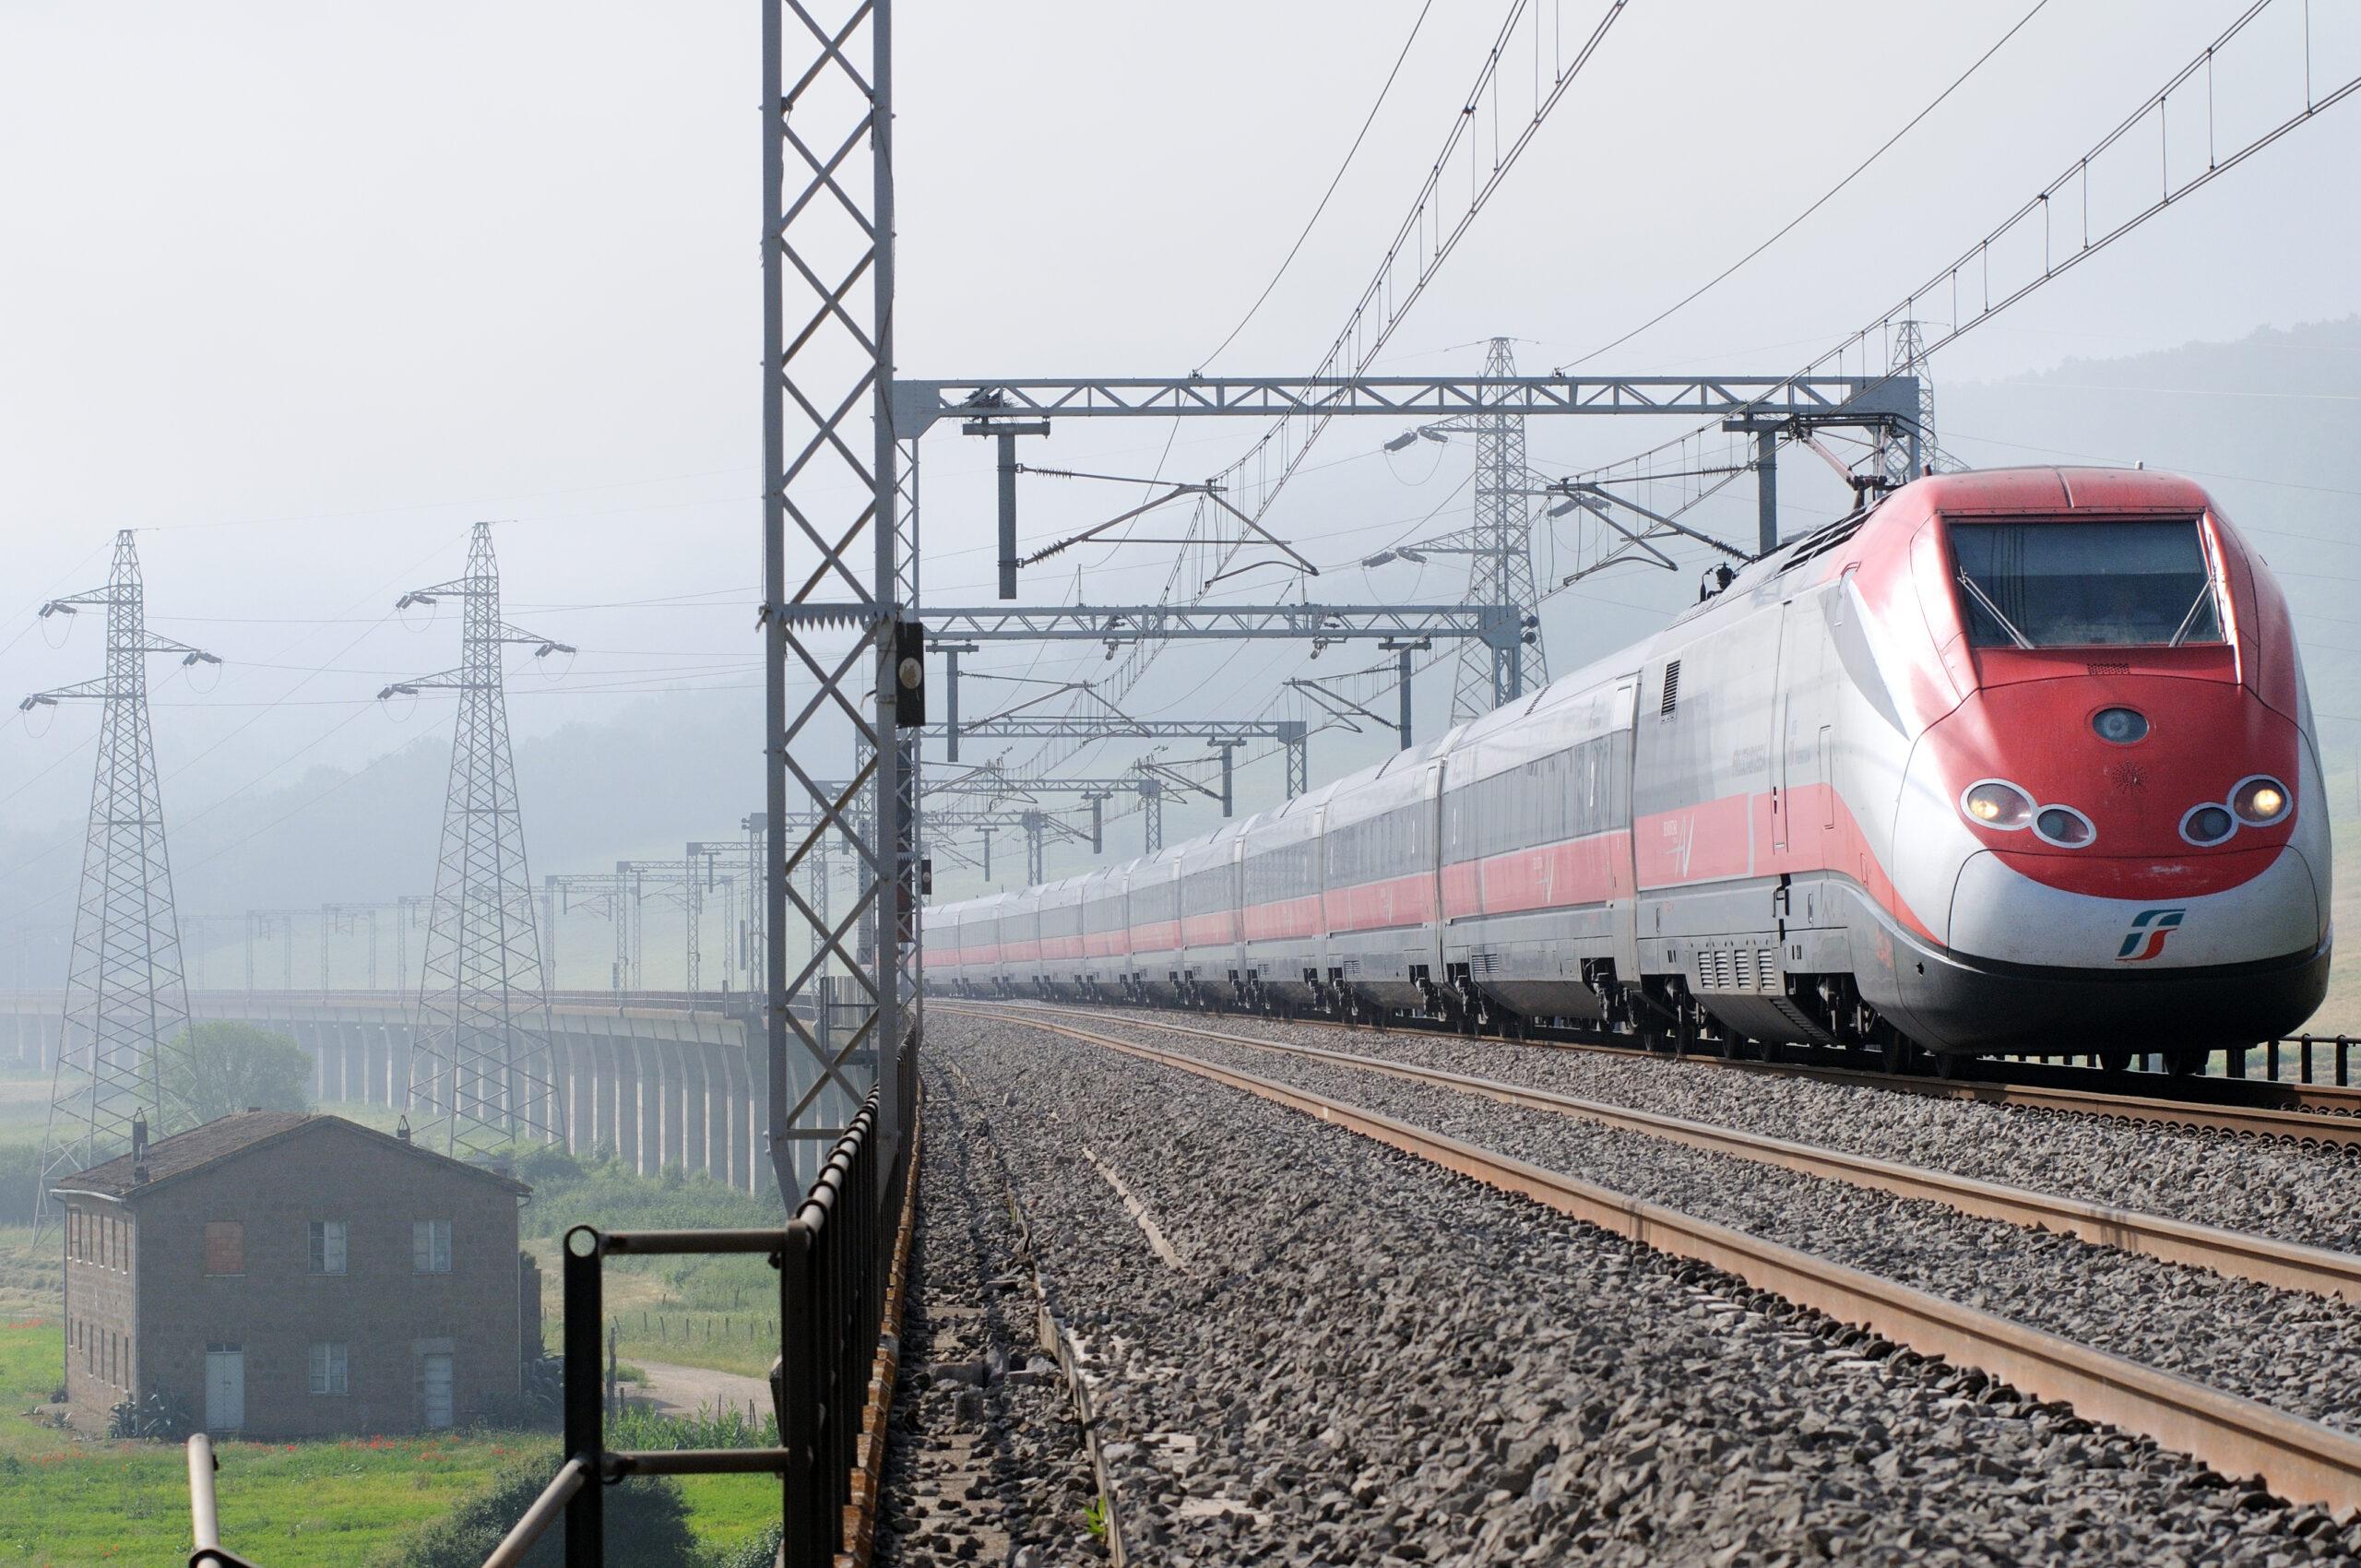 High-speed rail in Italy: A Frecciarossa ETR 500